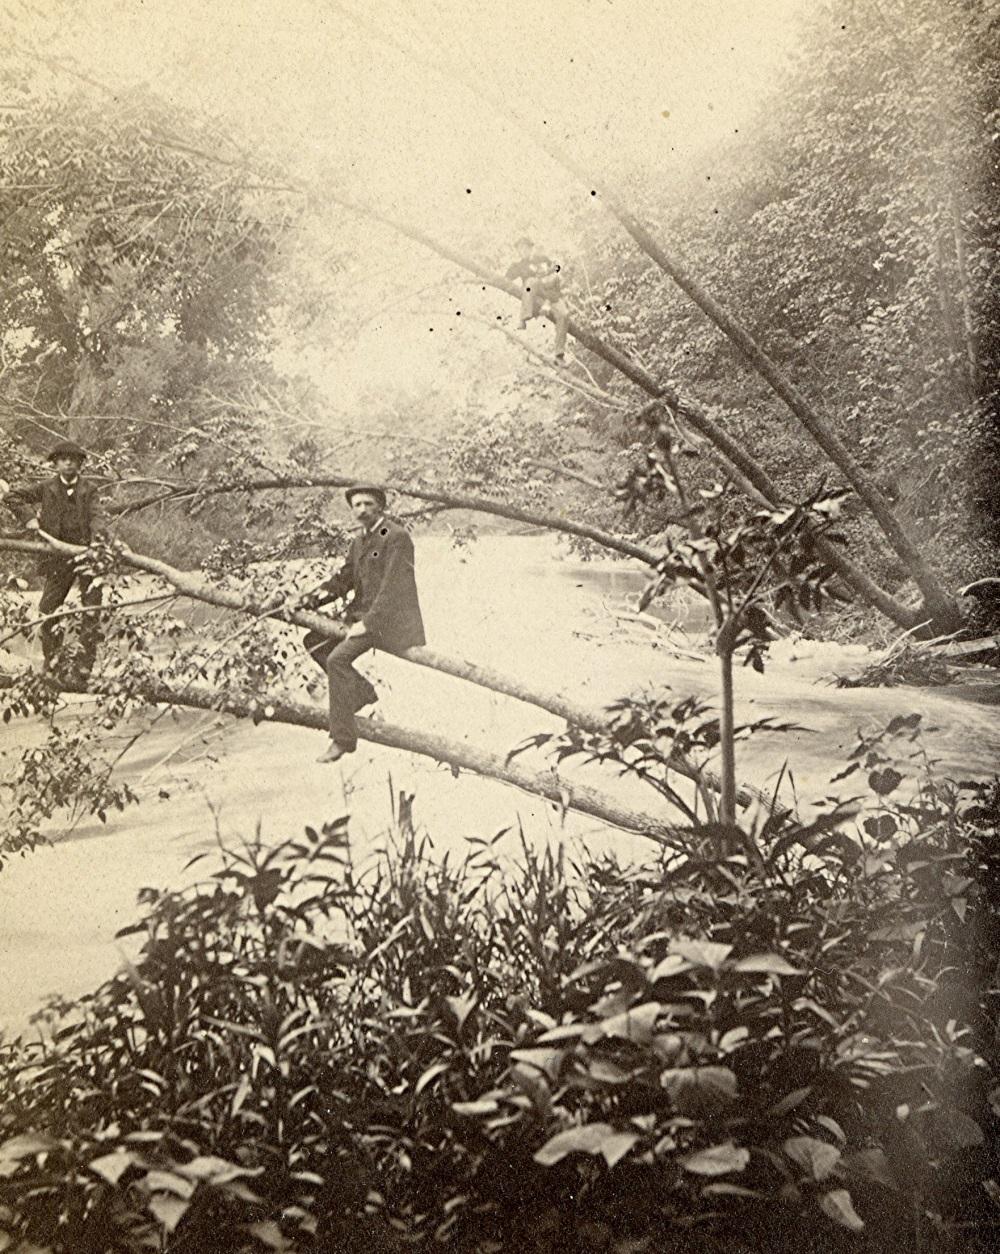 Menomonee Valley, Early 1880s. Photo courtesy of Jeff Beutner.